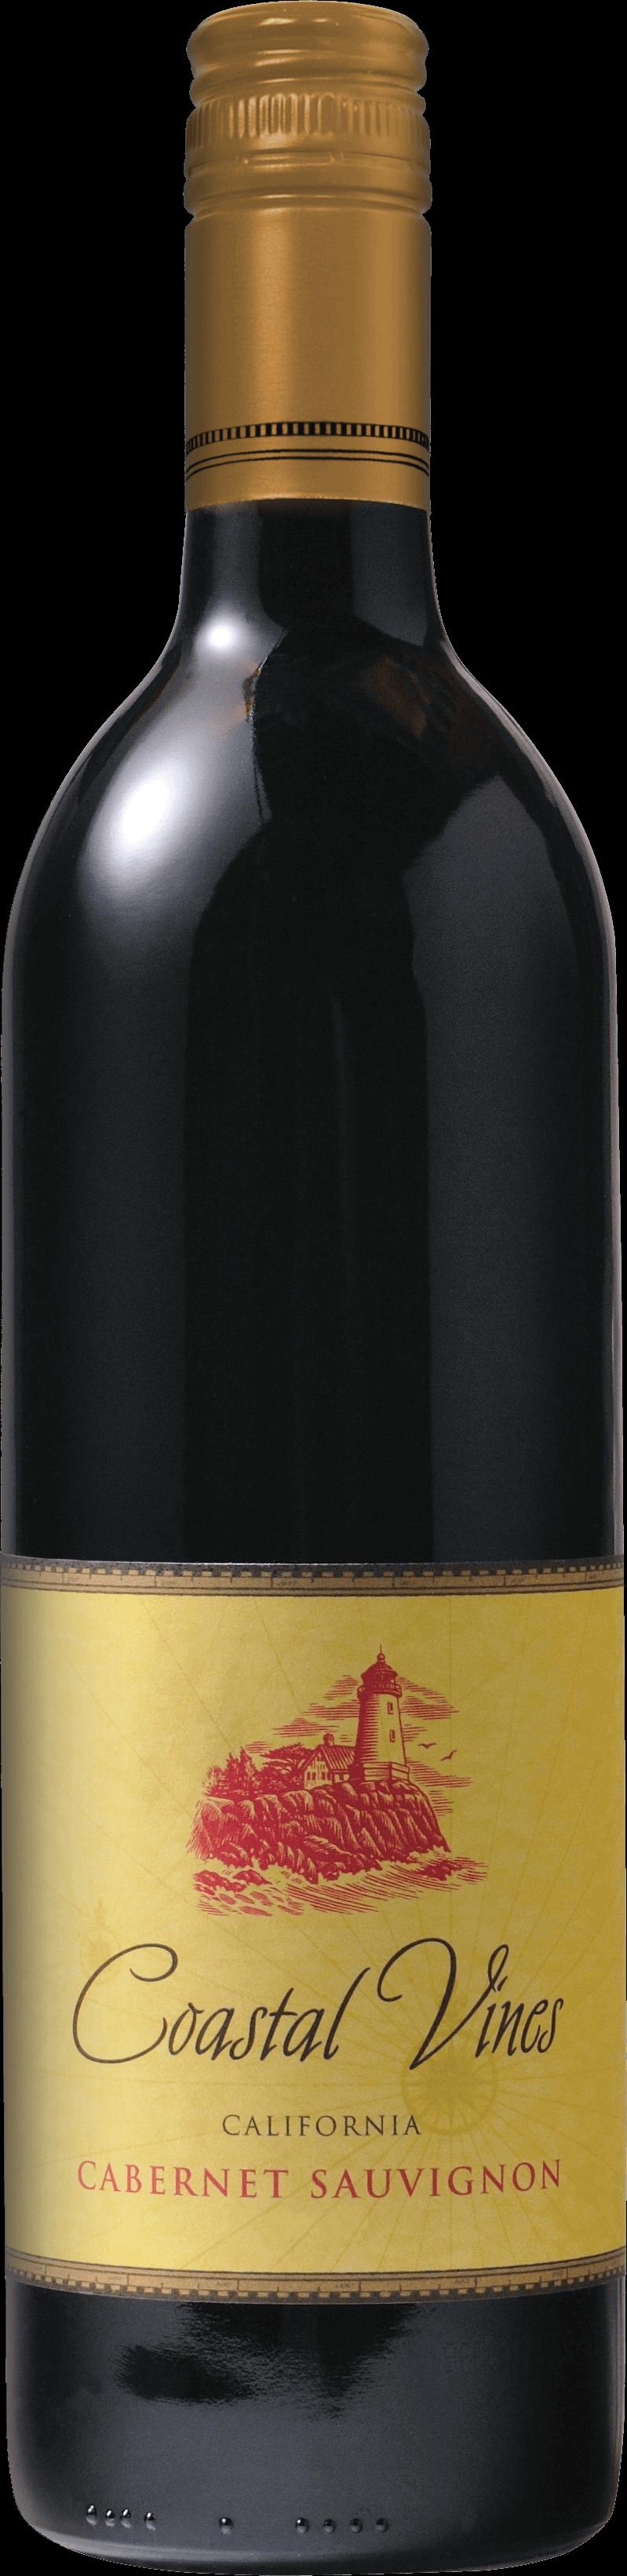 Coastal Vines Cabernet Sauvignon Bottleshot